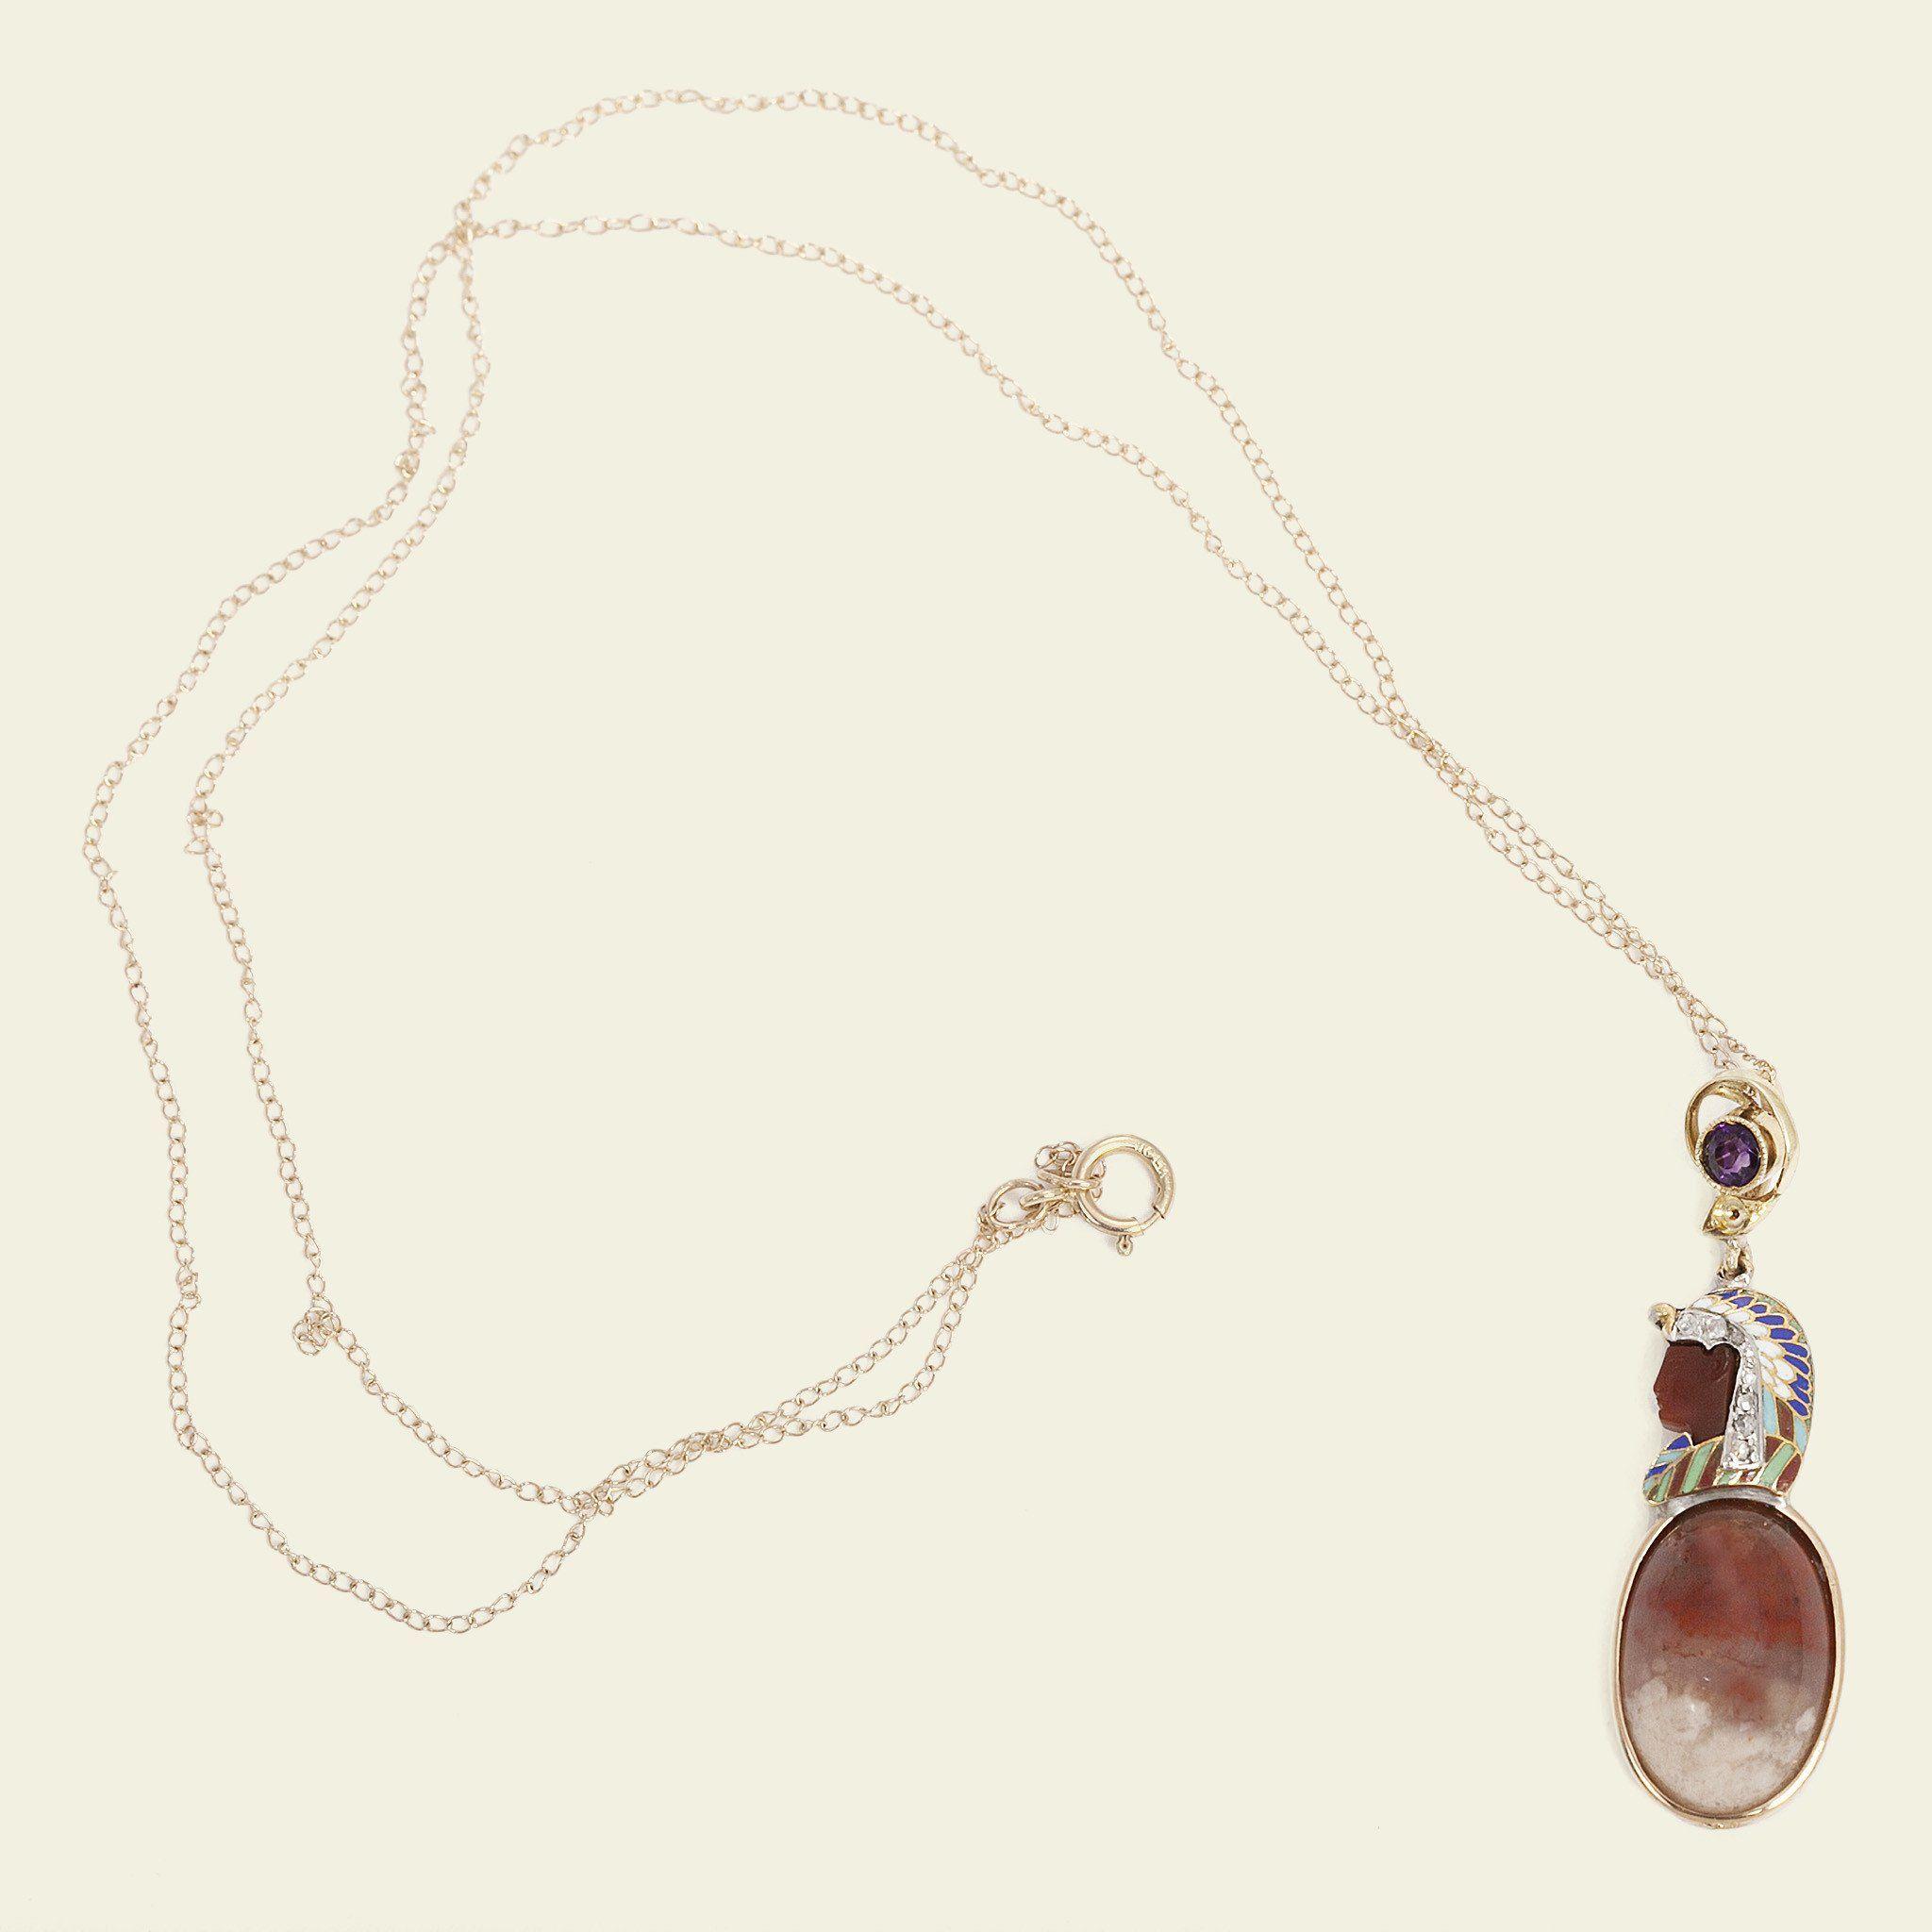 Enameled Egyptian Revival Pharaoh Necklace